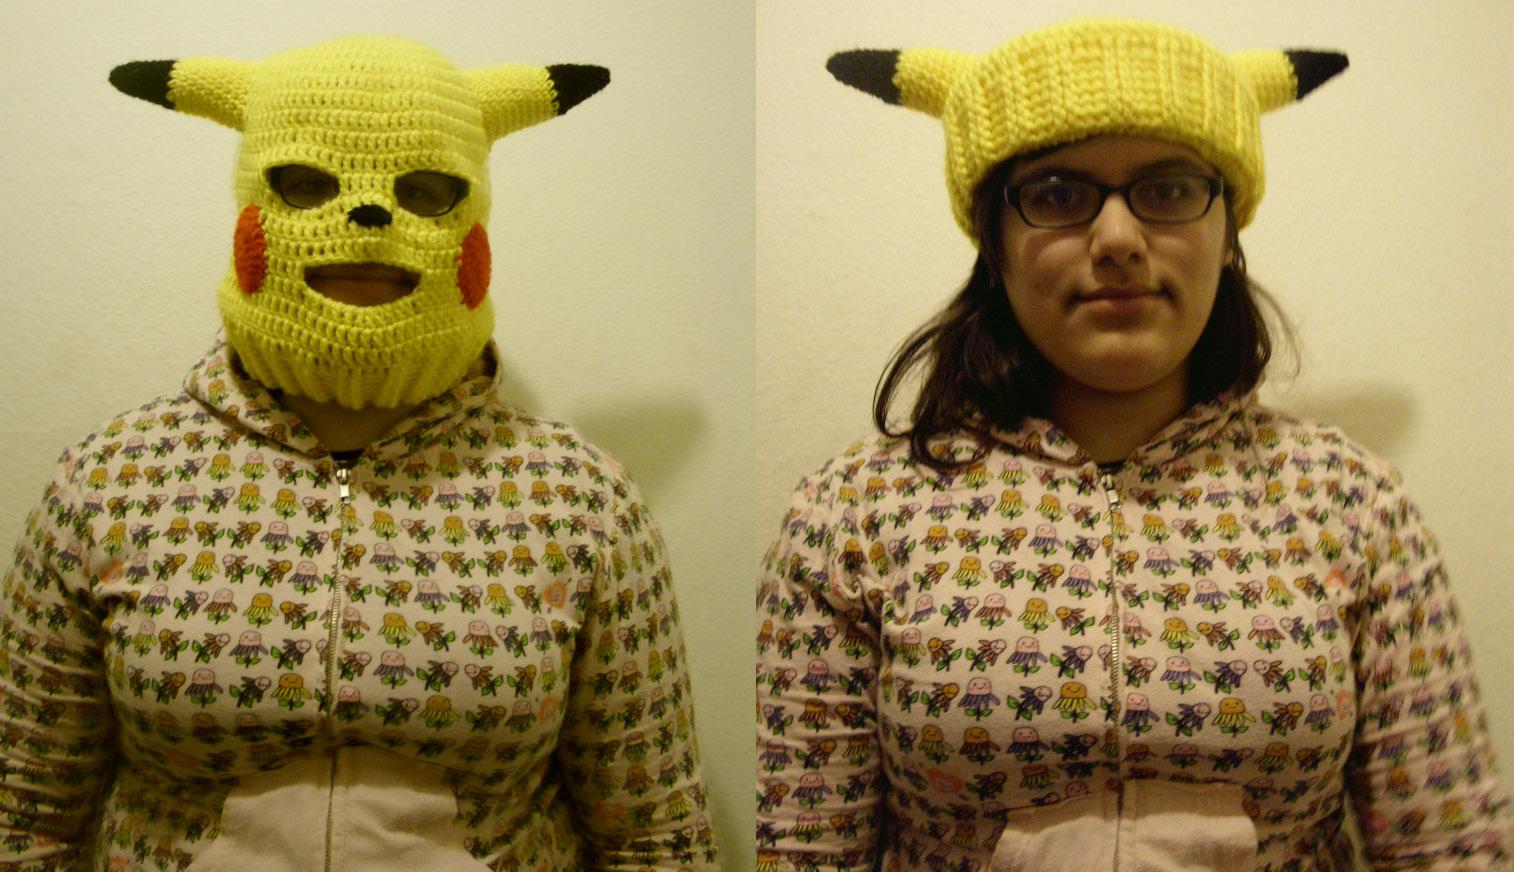 Pikachu convertible ski mask by Sugarcoatidli3z on DeviantArt